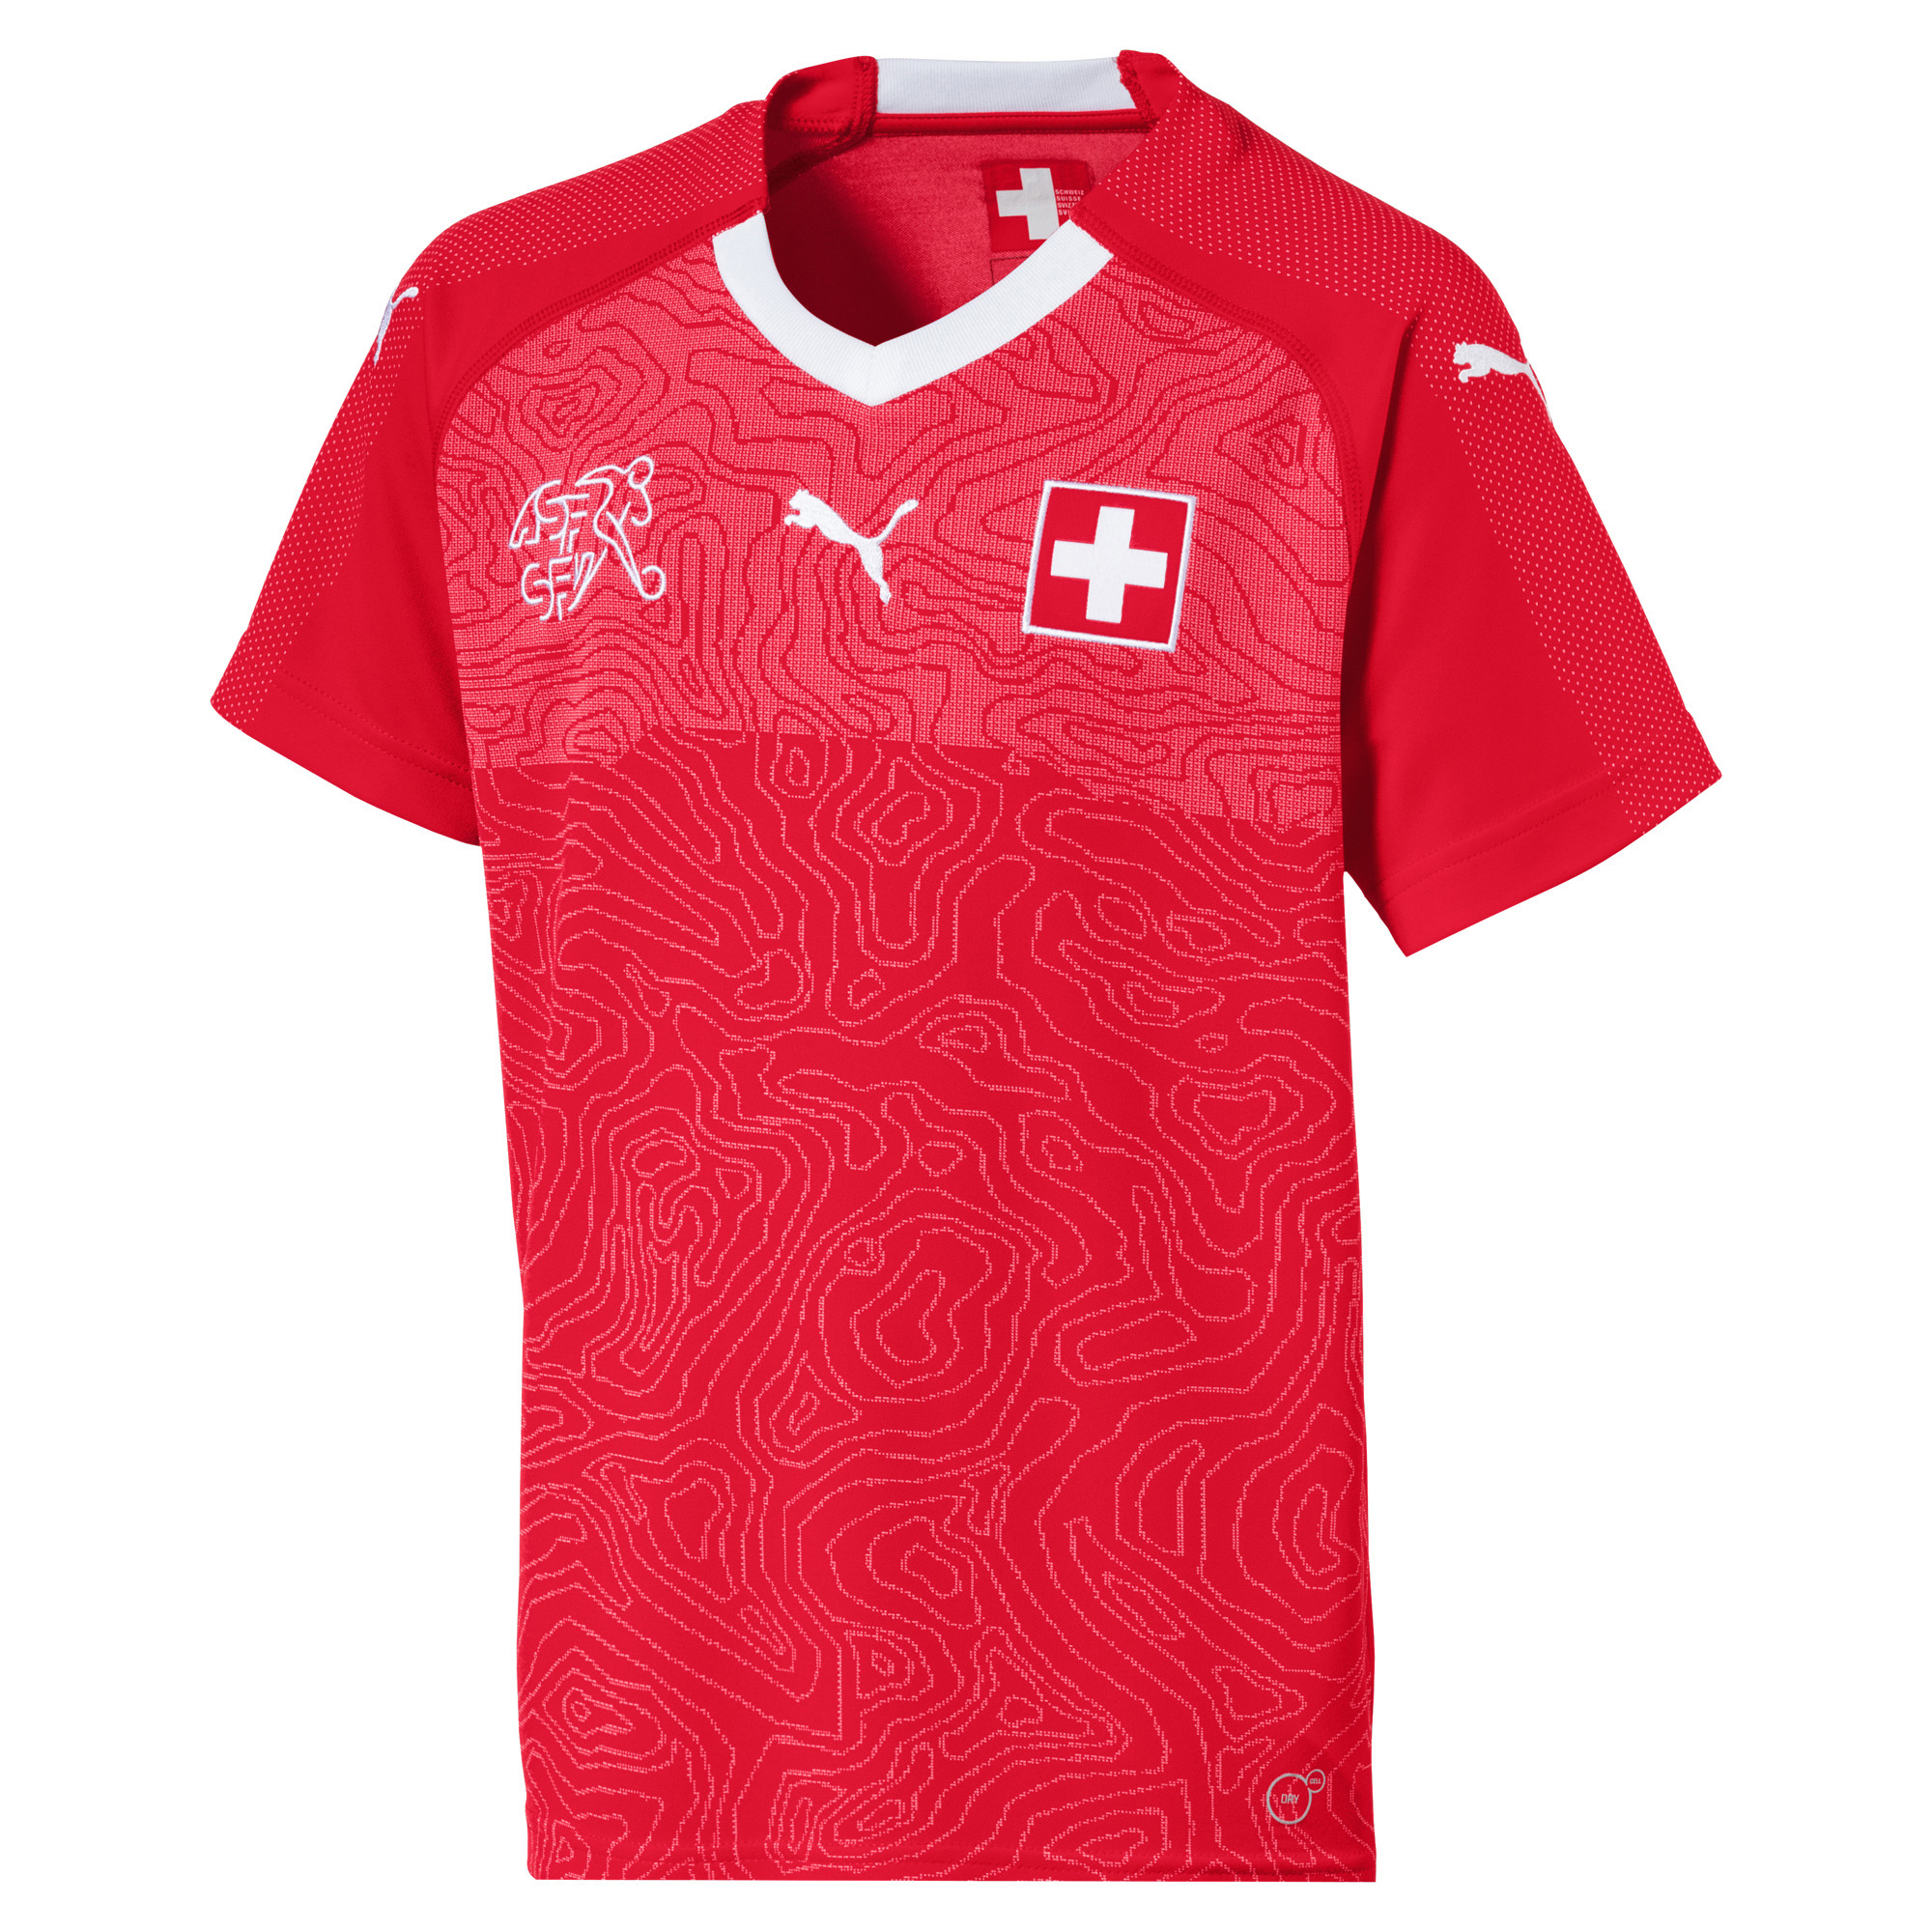 Rodriguez 13 Schweiz Kinder WM Trikot 2018 19